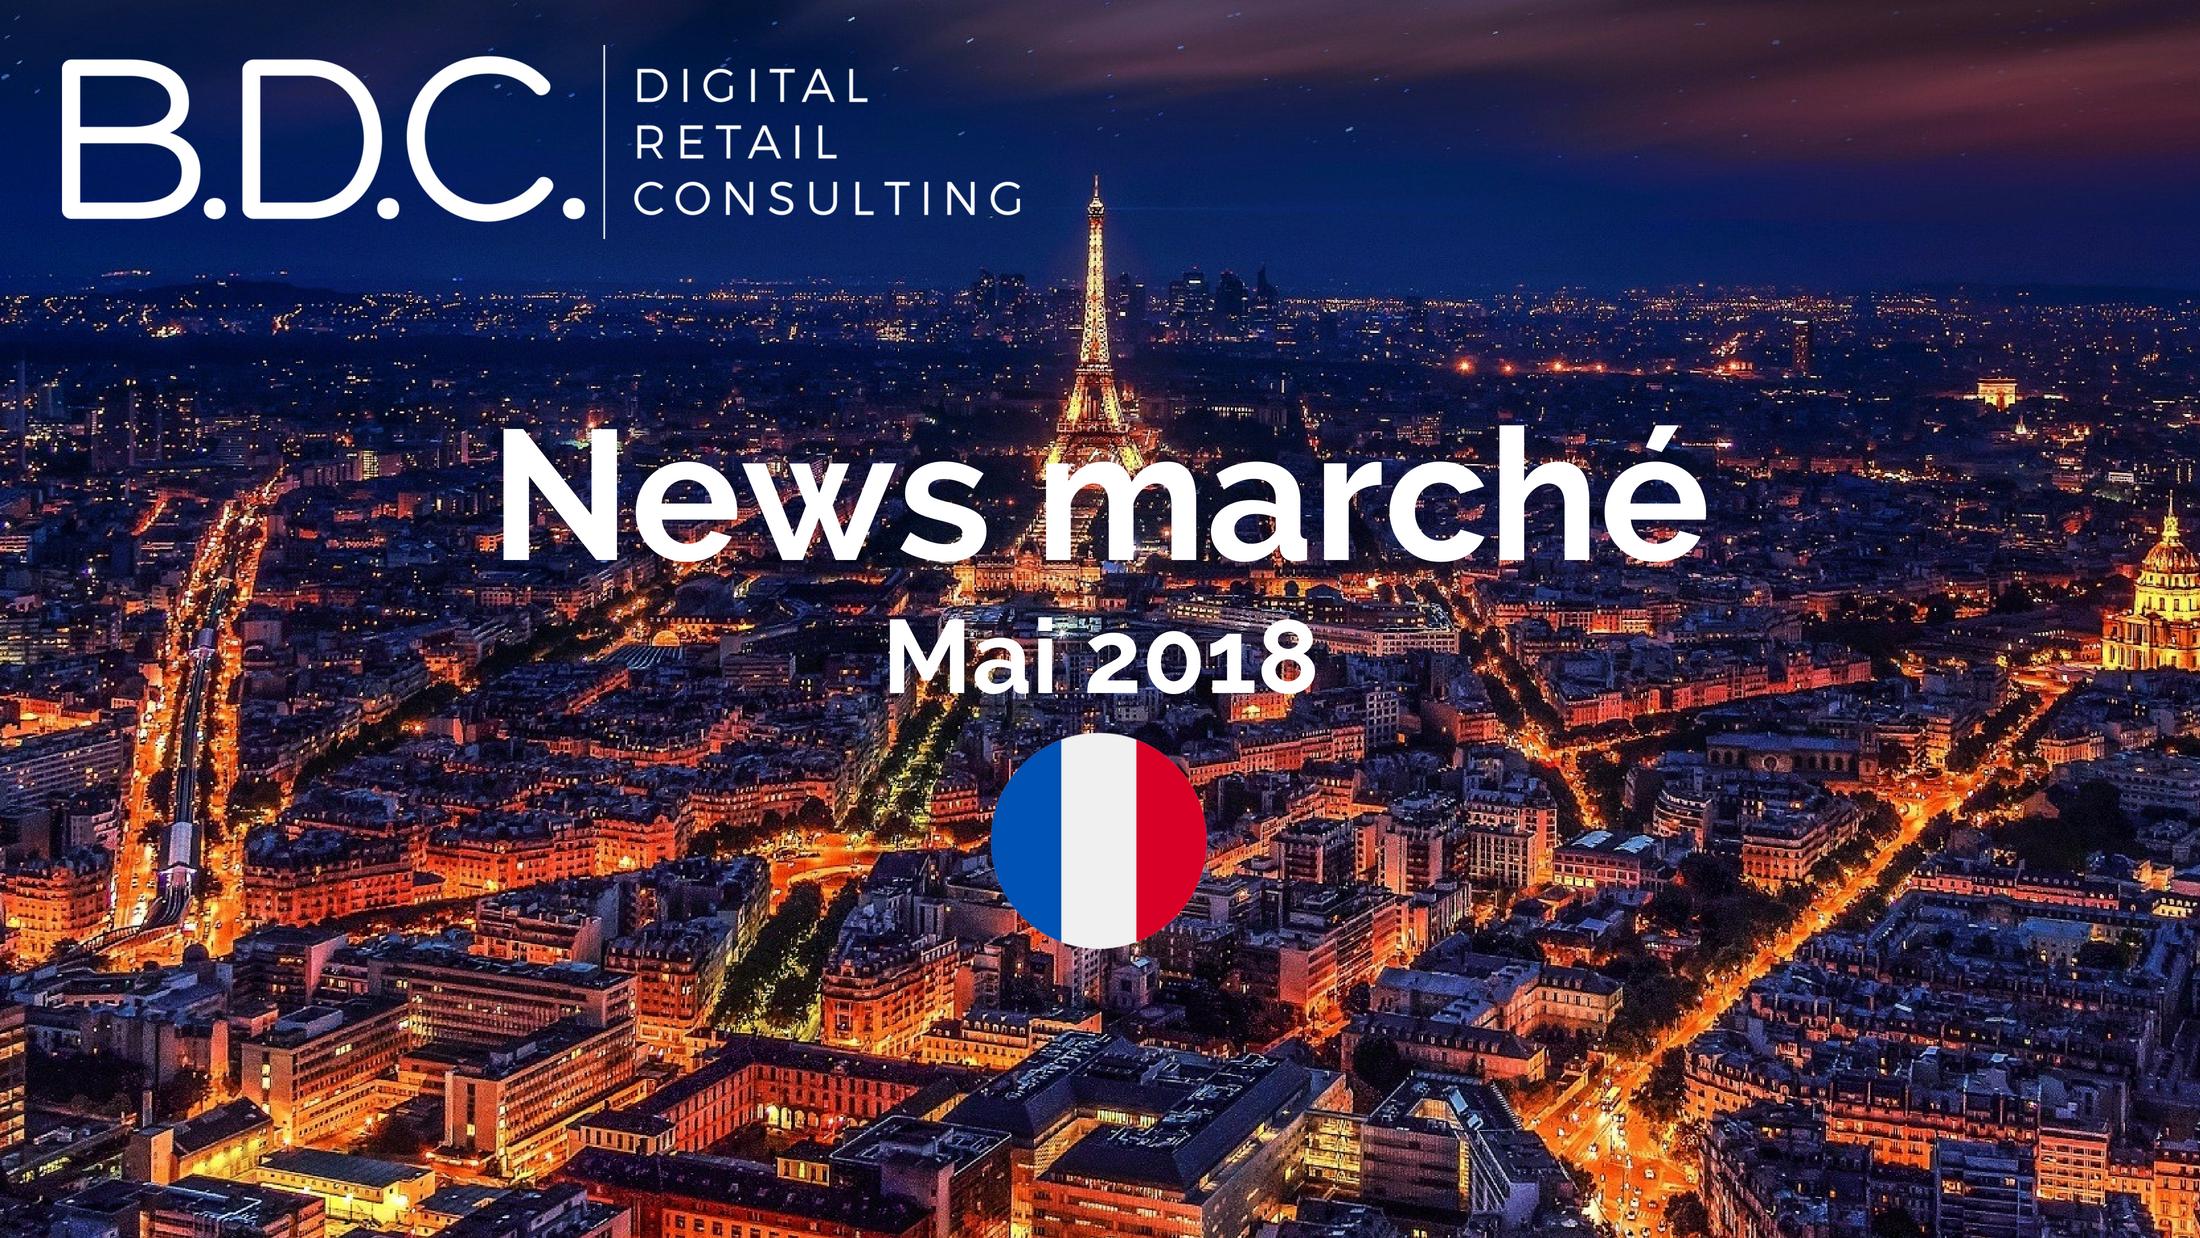 Trends News - News marché - Mai 2018